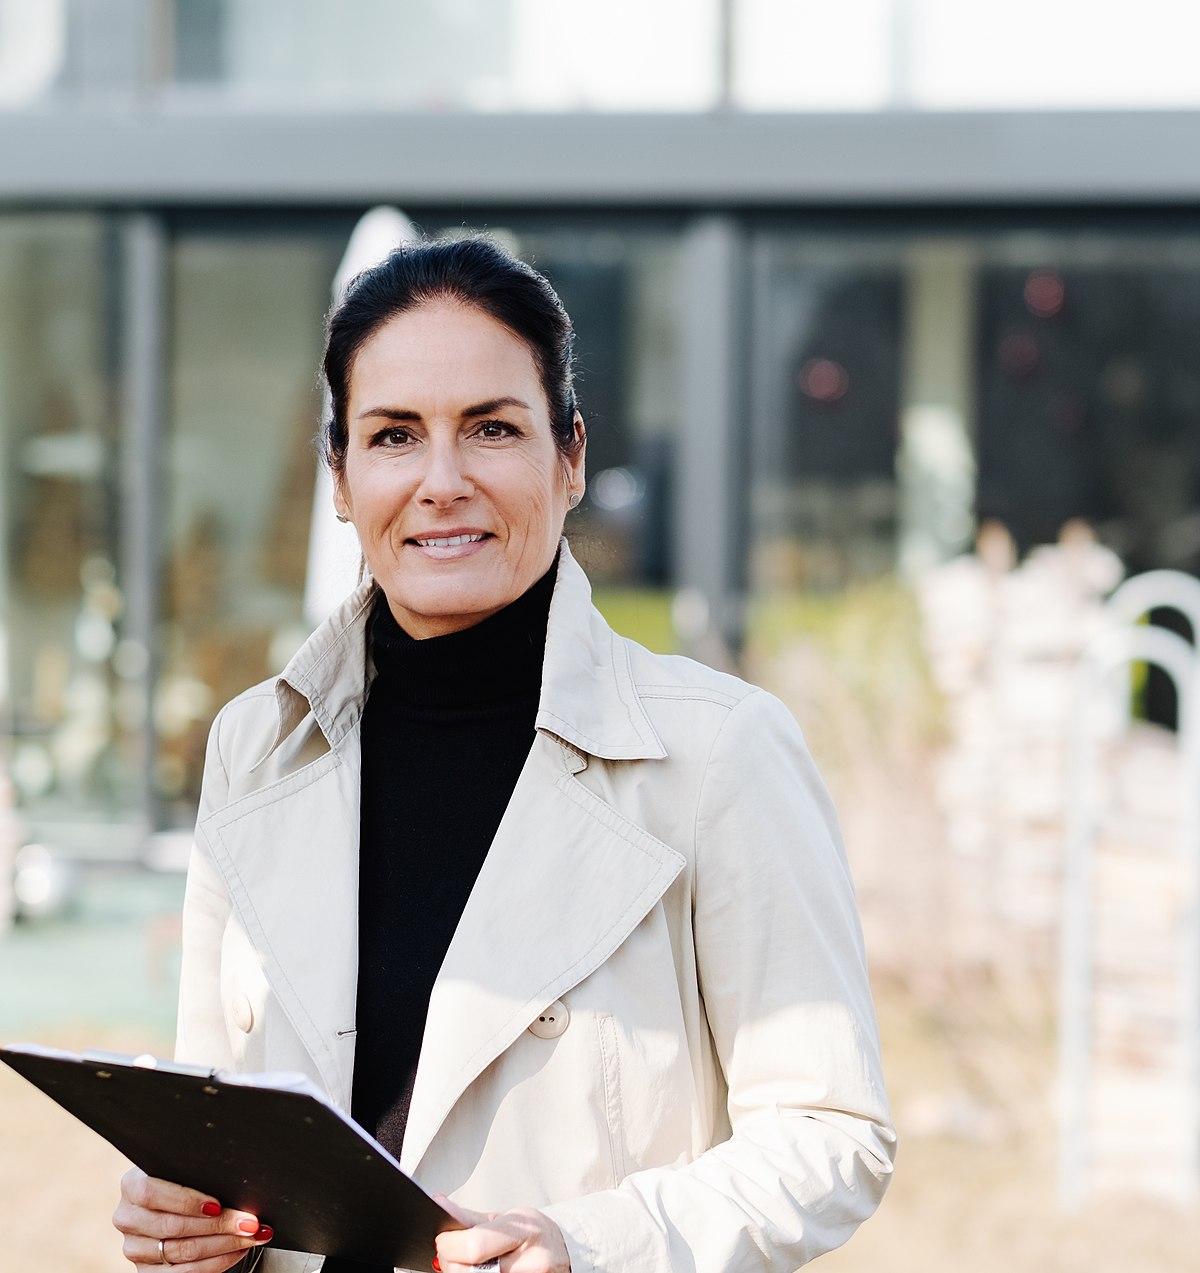 Interview Mit Herrn John Kosmalla Manuela Reibold Rolinger